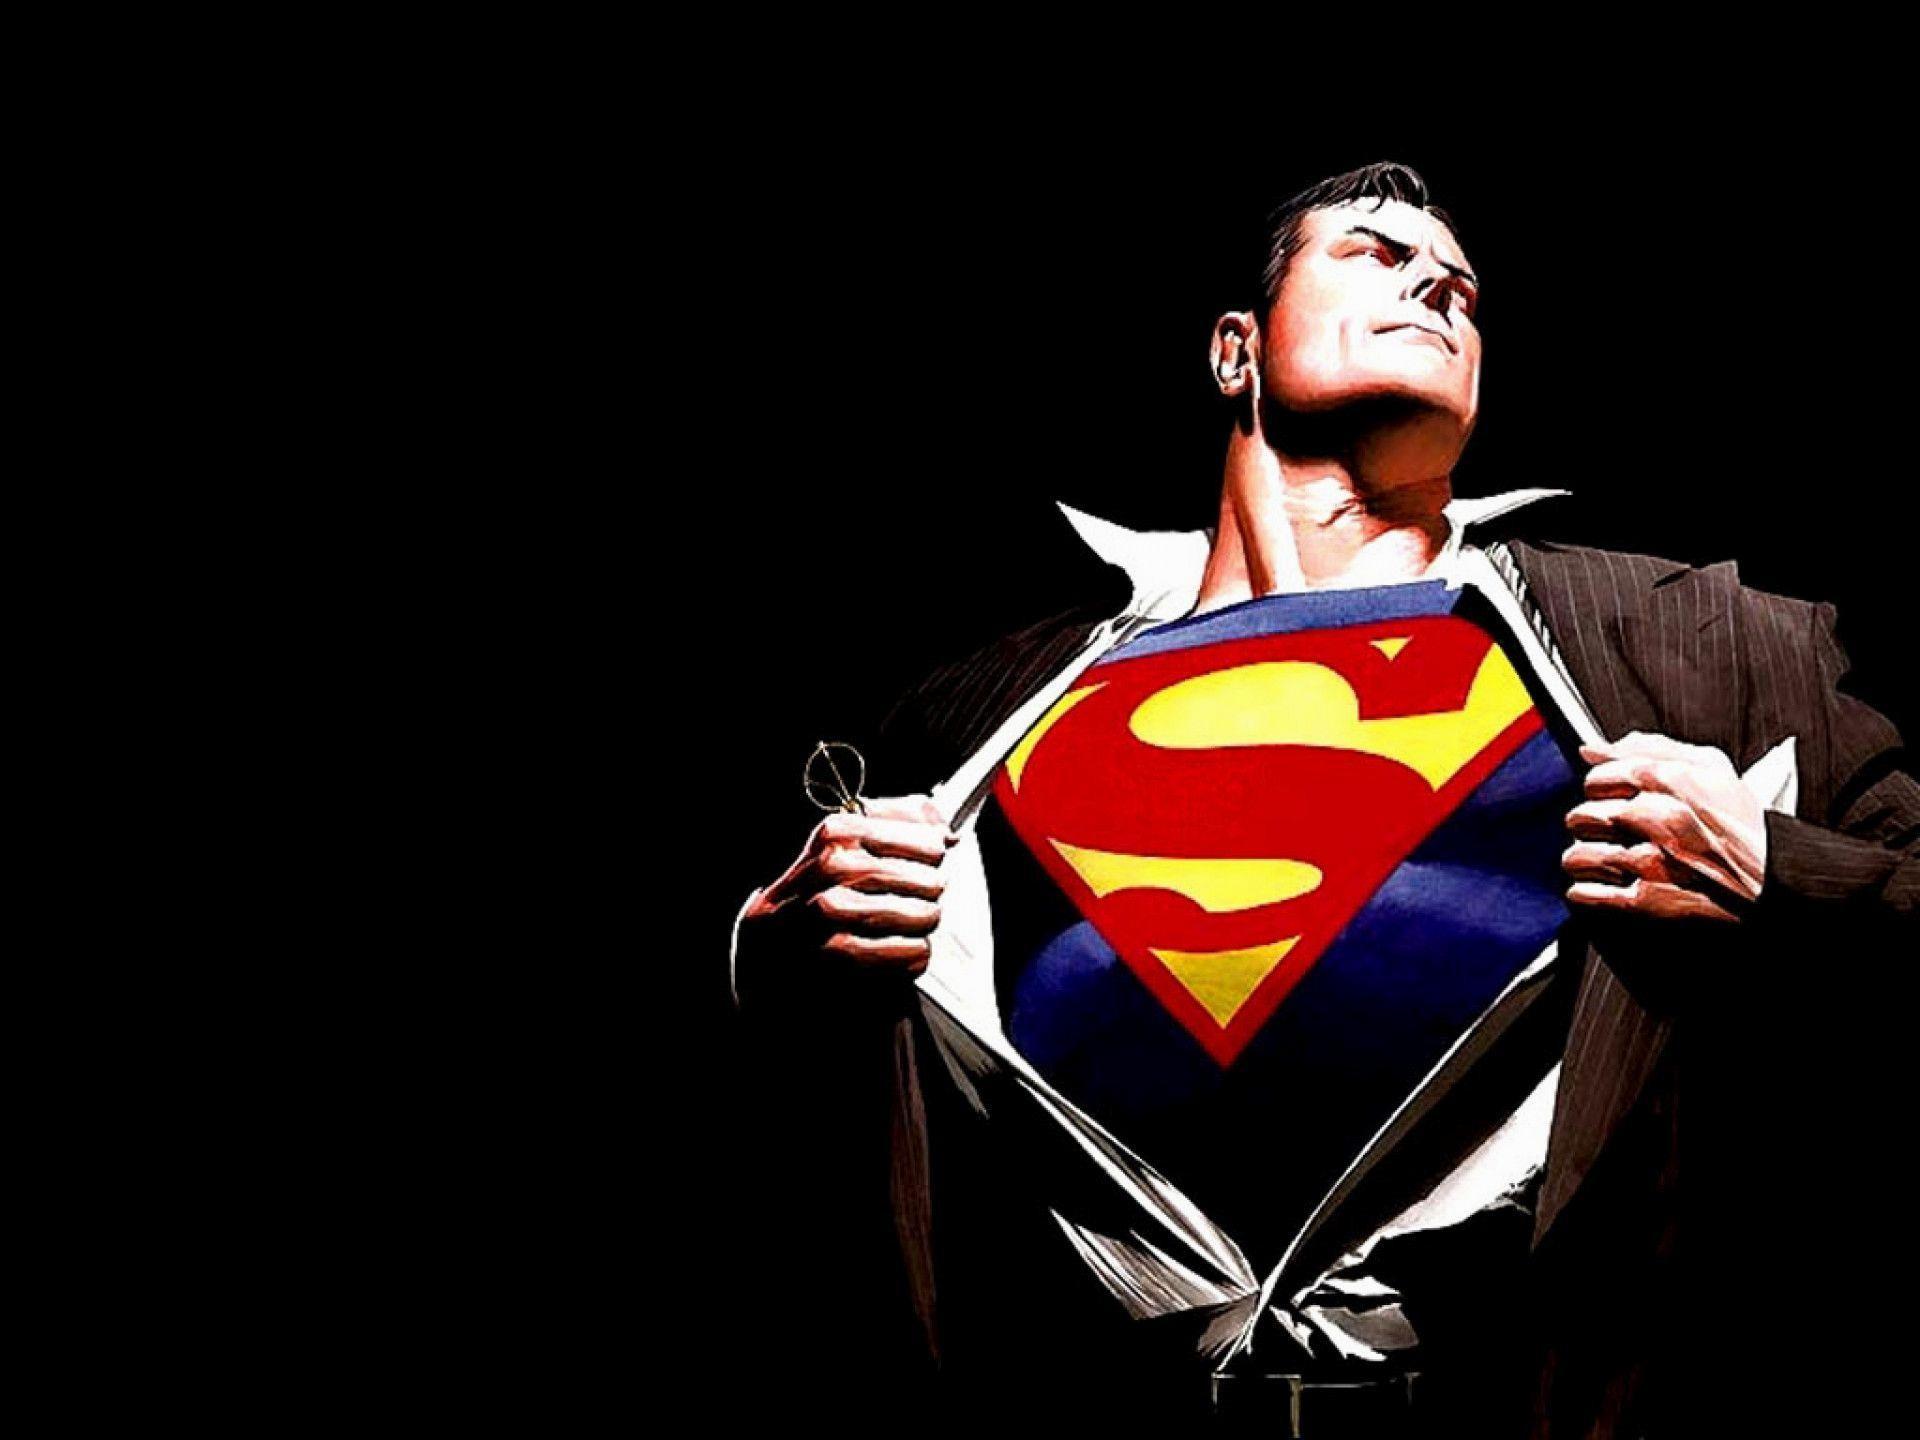 Superman-Wallpapers-full-HD-1080P